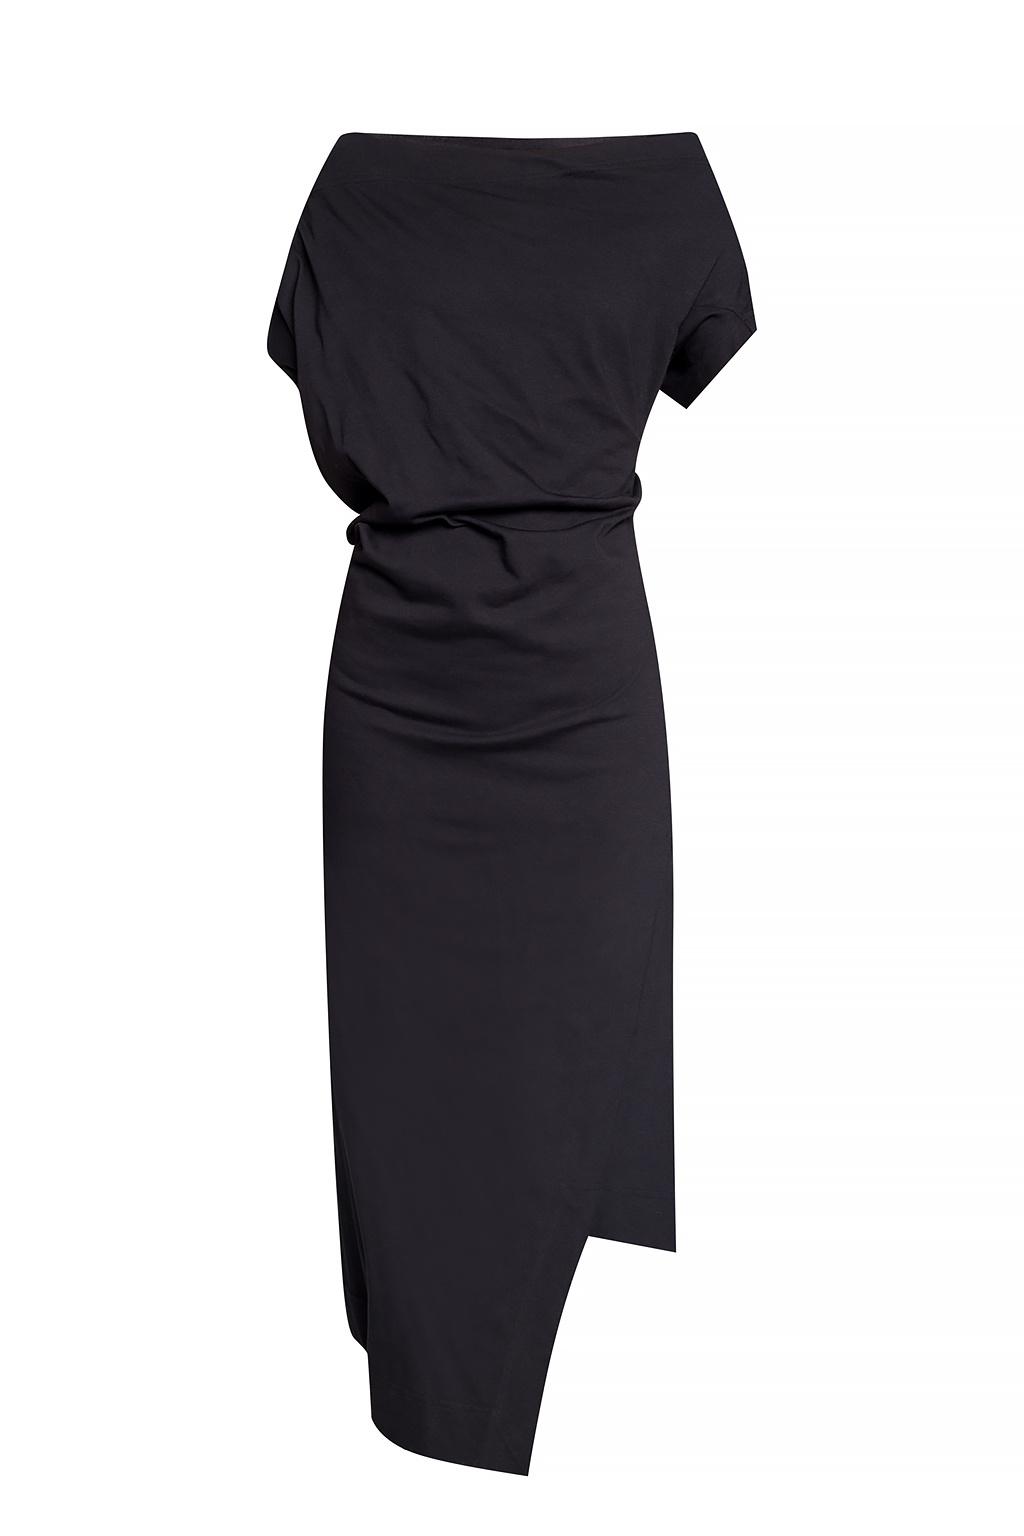 Vivienne Westwood Asymmetrical dress